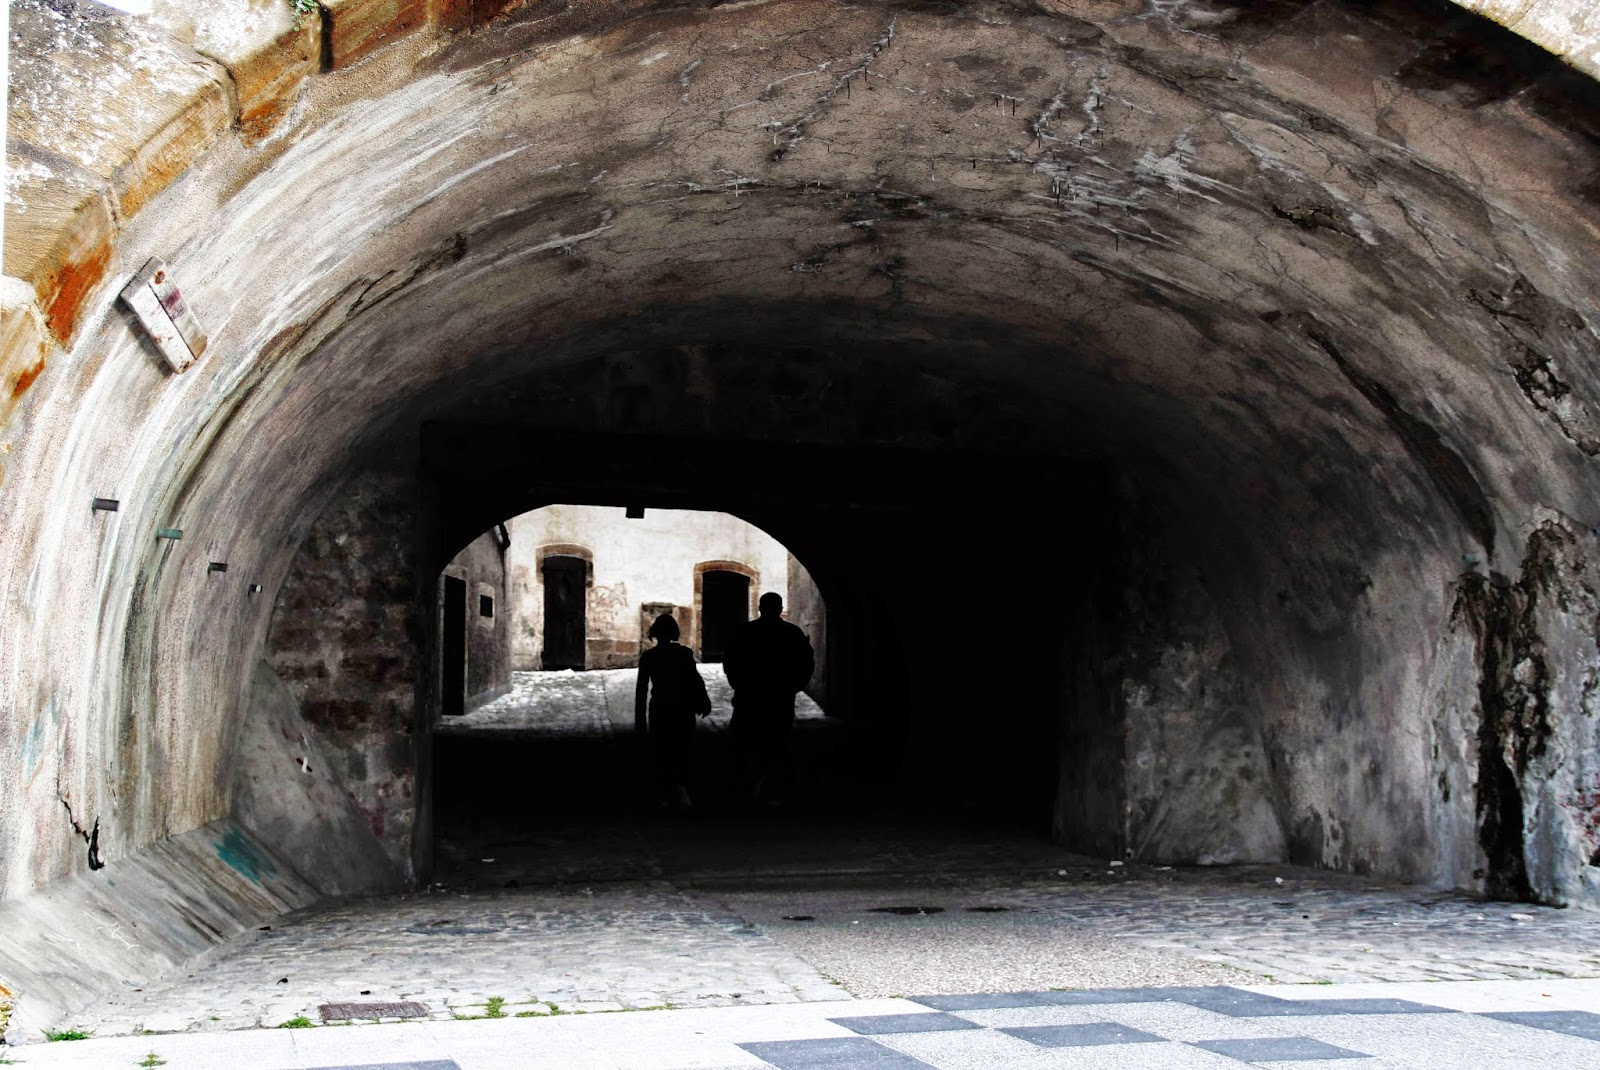 Metz tunnels